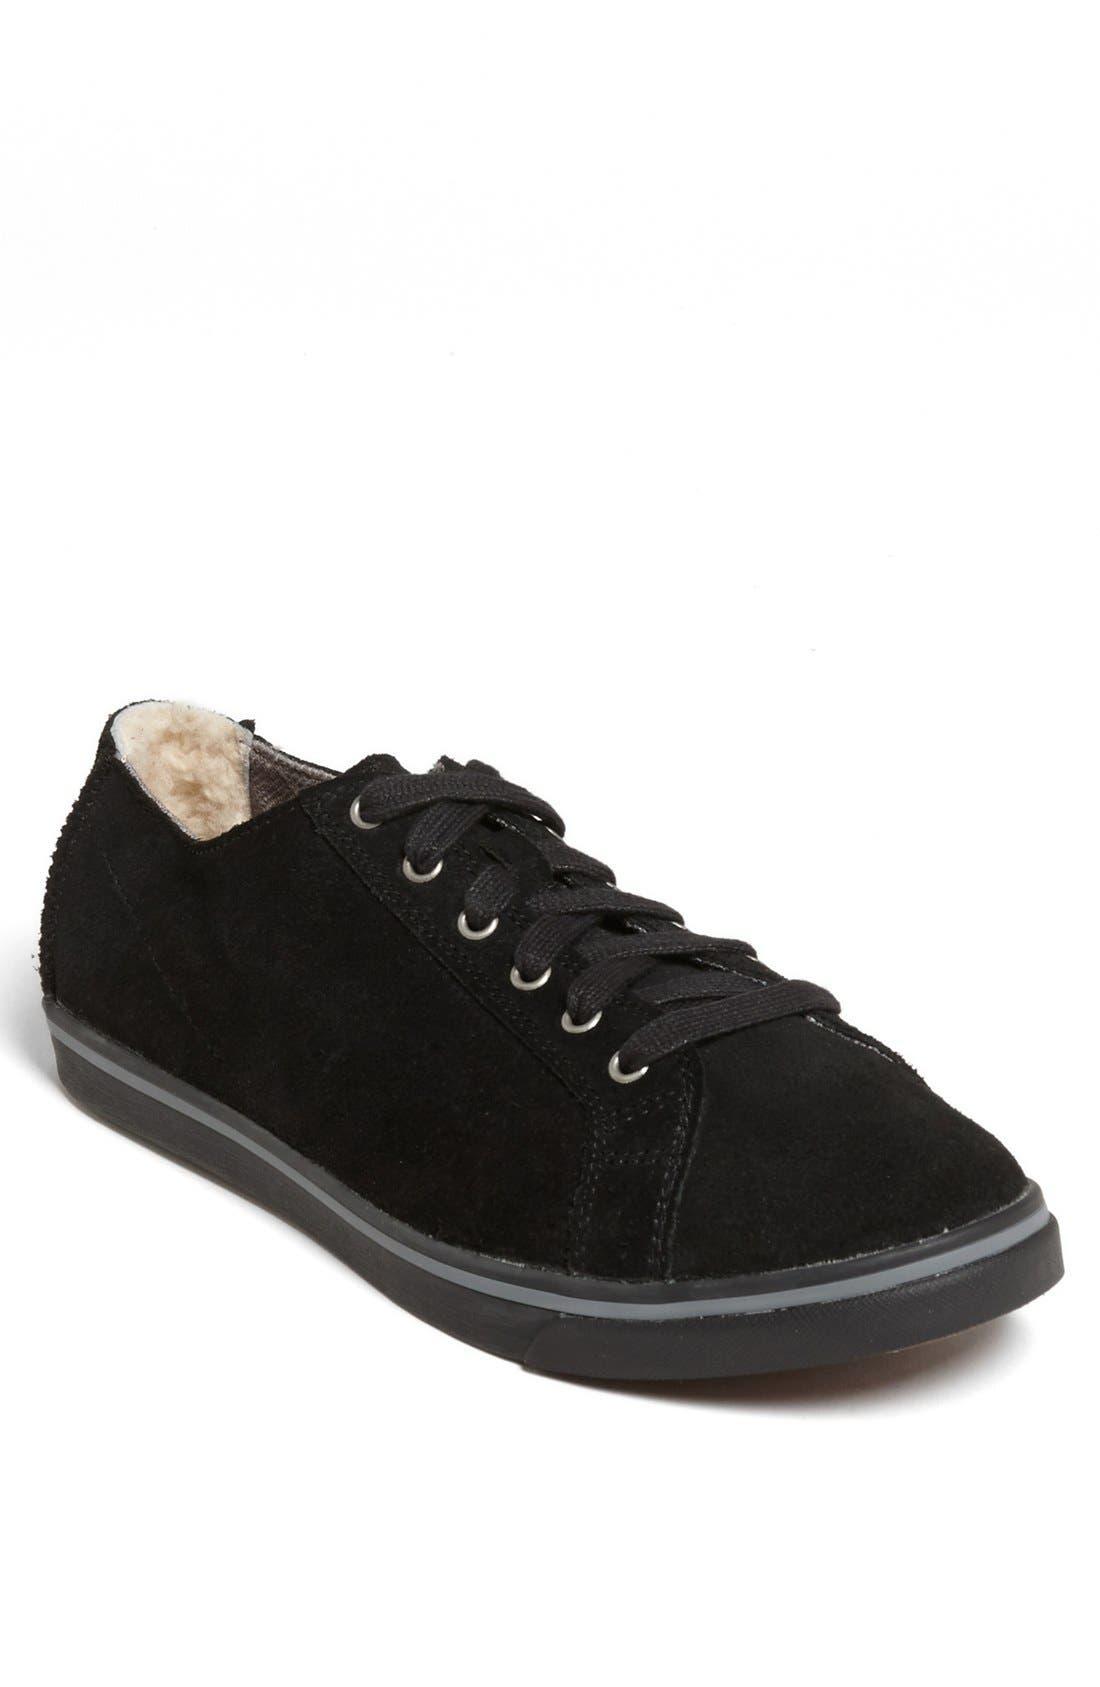 Australia 'Vanowen' Sneaker,                         Main,                         color, 001